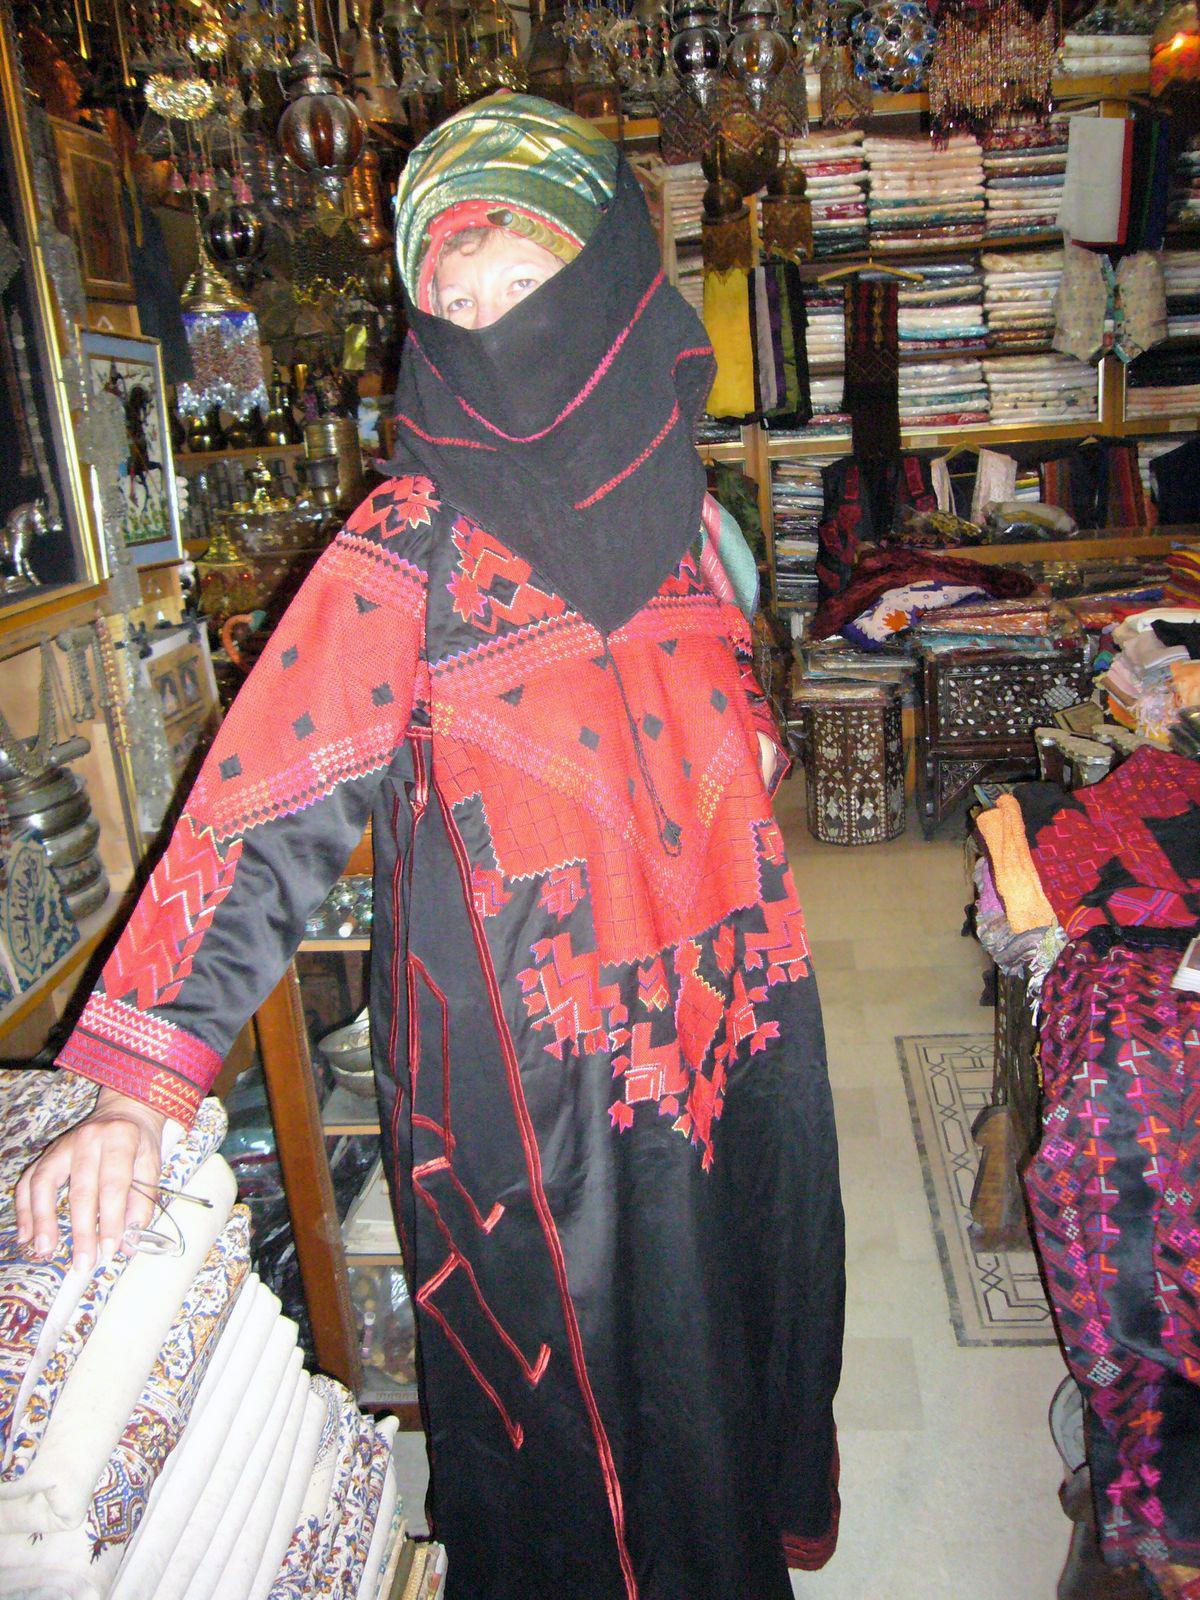 susan at the sultan's shop